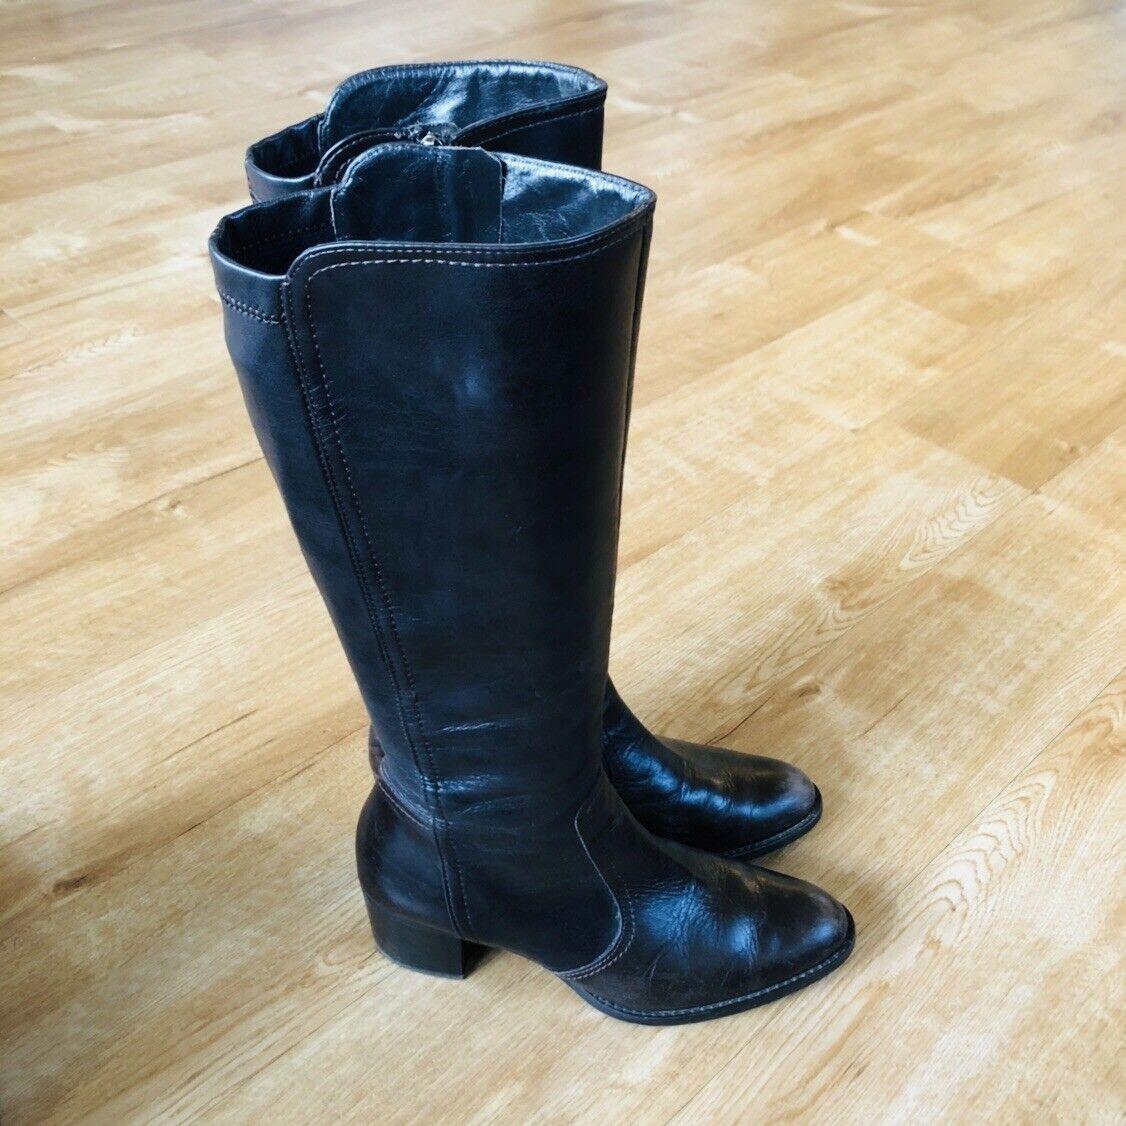 mujer's Paul verde marrón Leather Tall botas 7